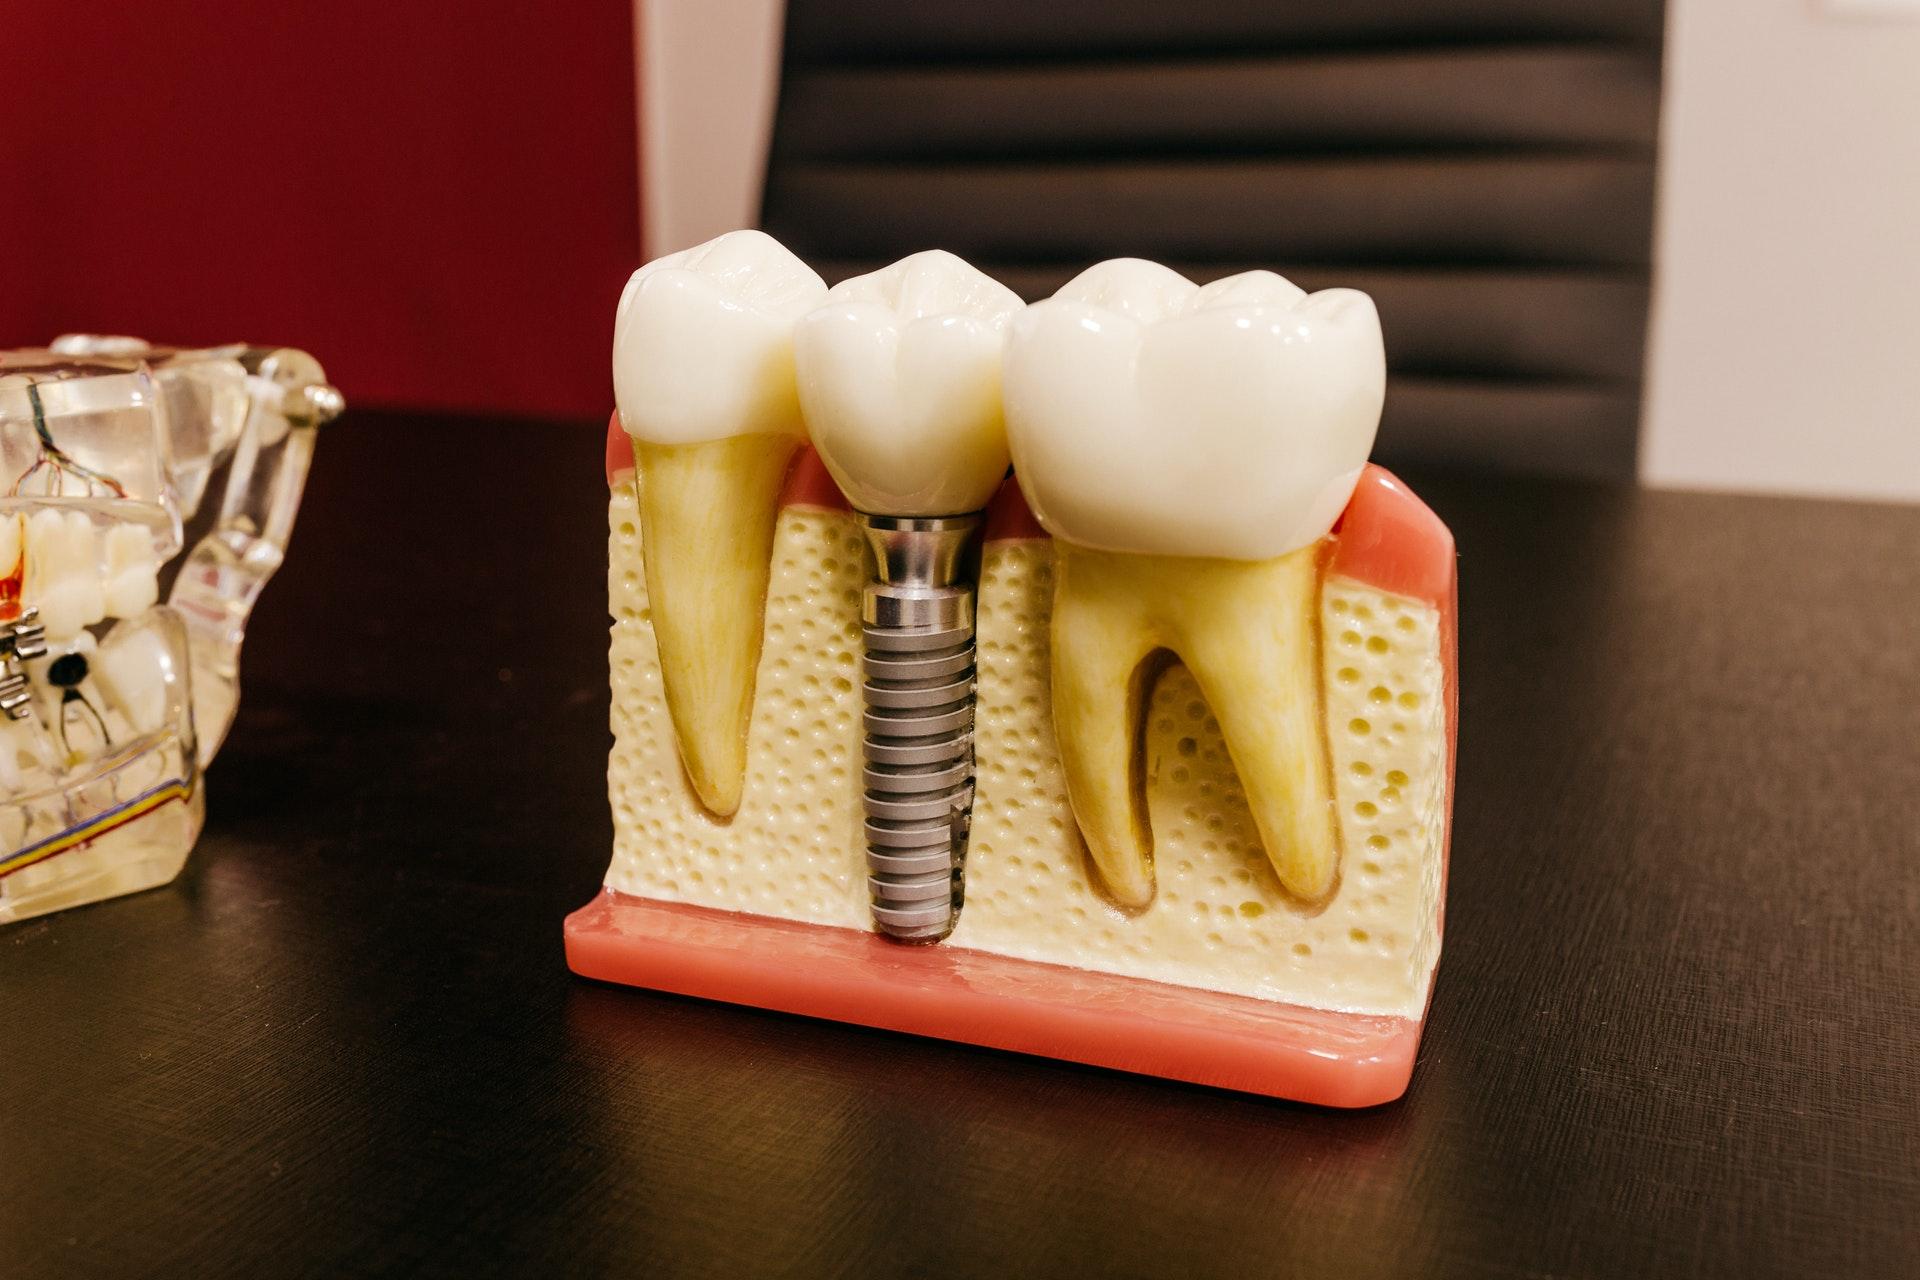 Dental Implant Surgery Ottawa | Dental Implants Ottawa | Implant Dentist Ottawa